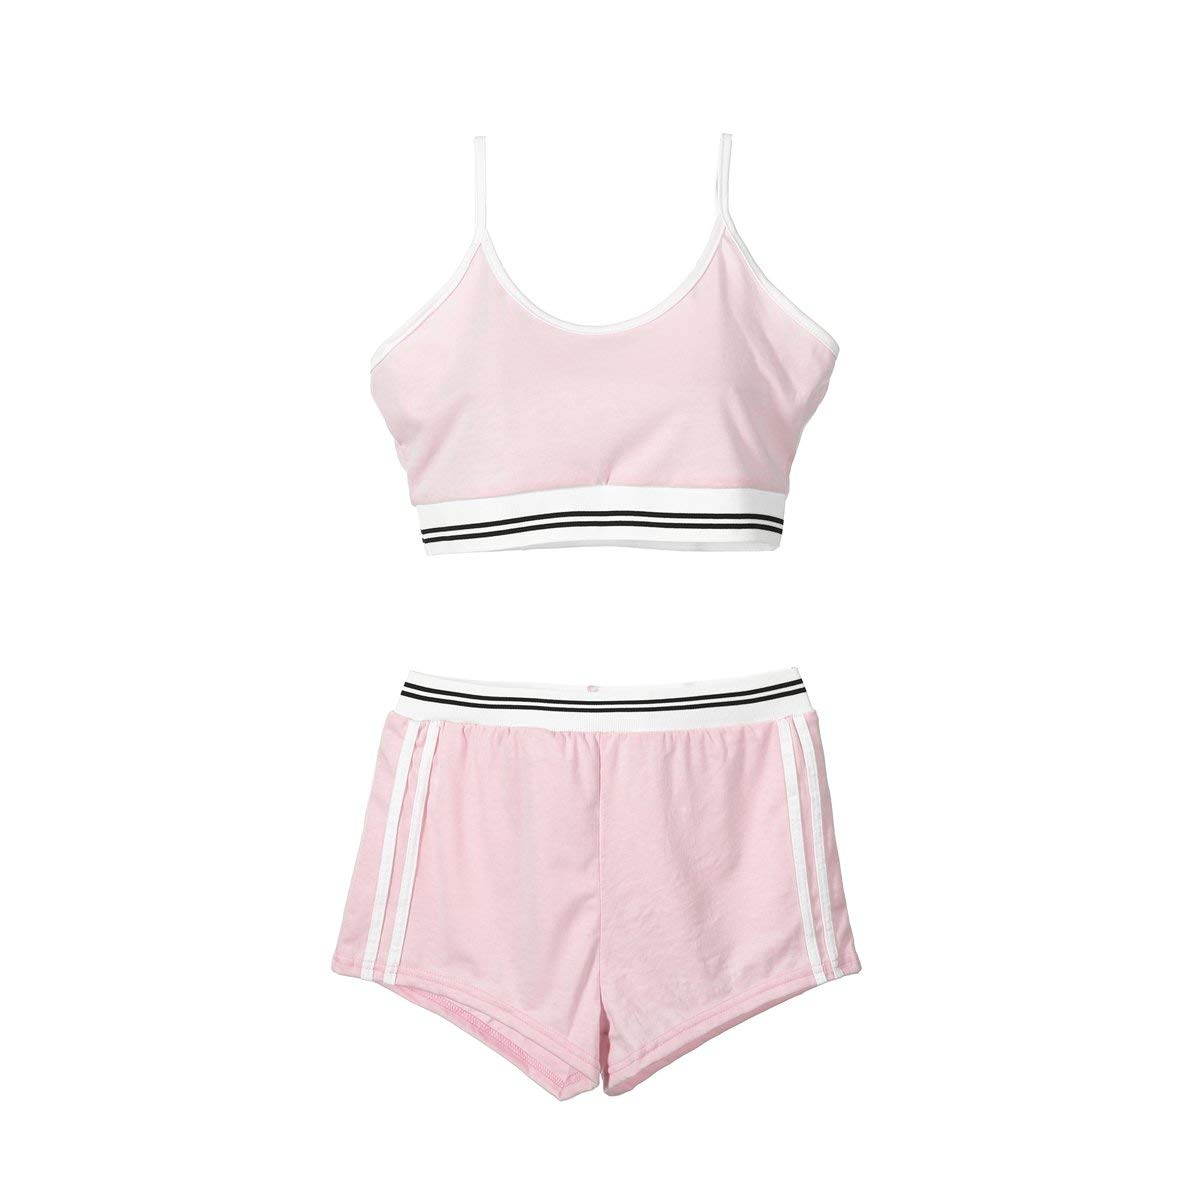 Women Sports Yoga Spaghetti Strap Crop Tank Top and High Waist Shorts Set